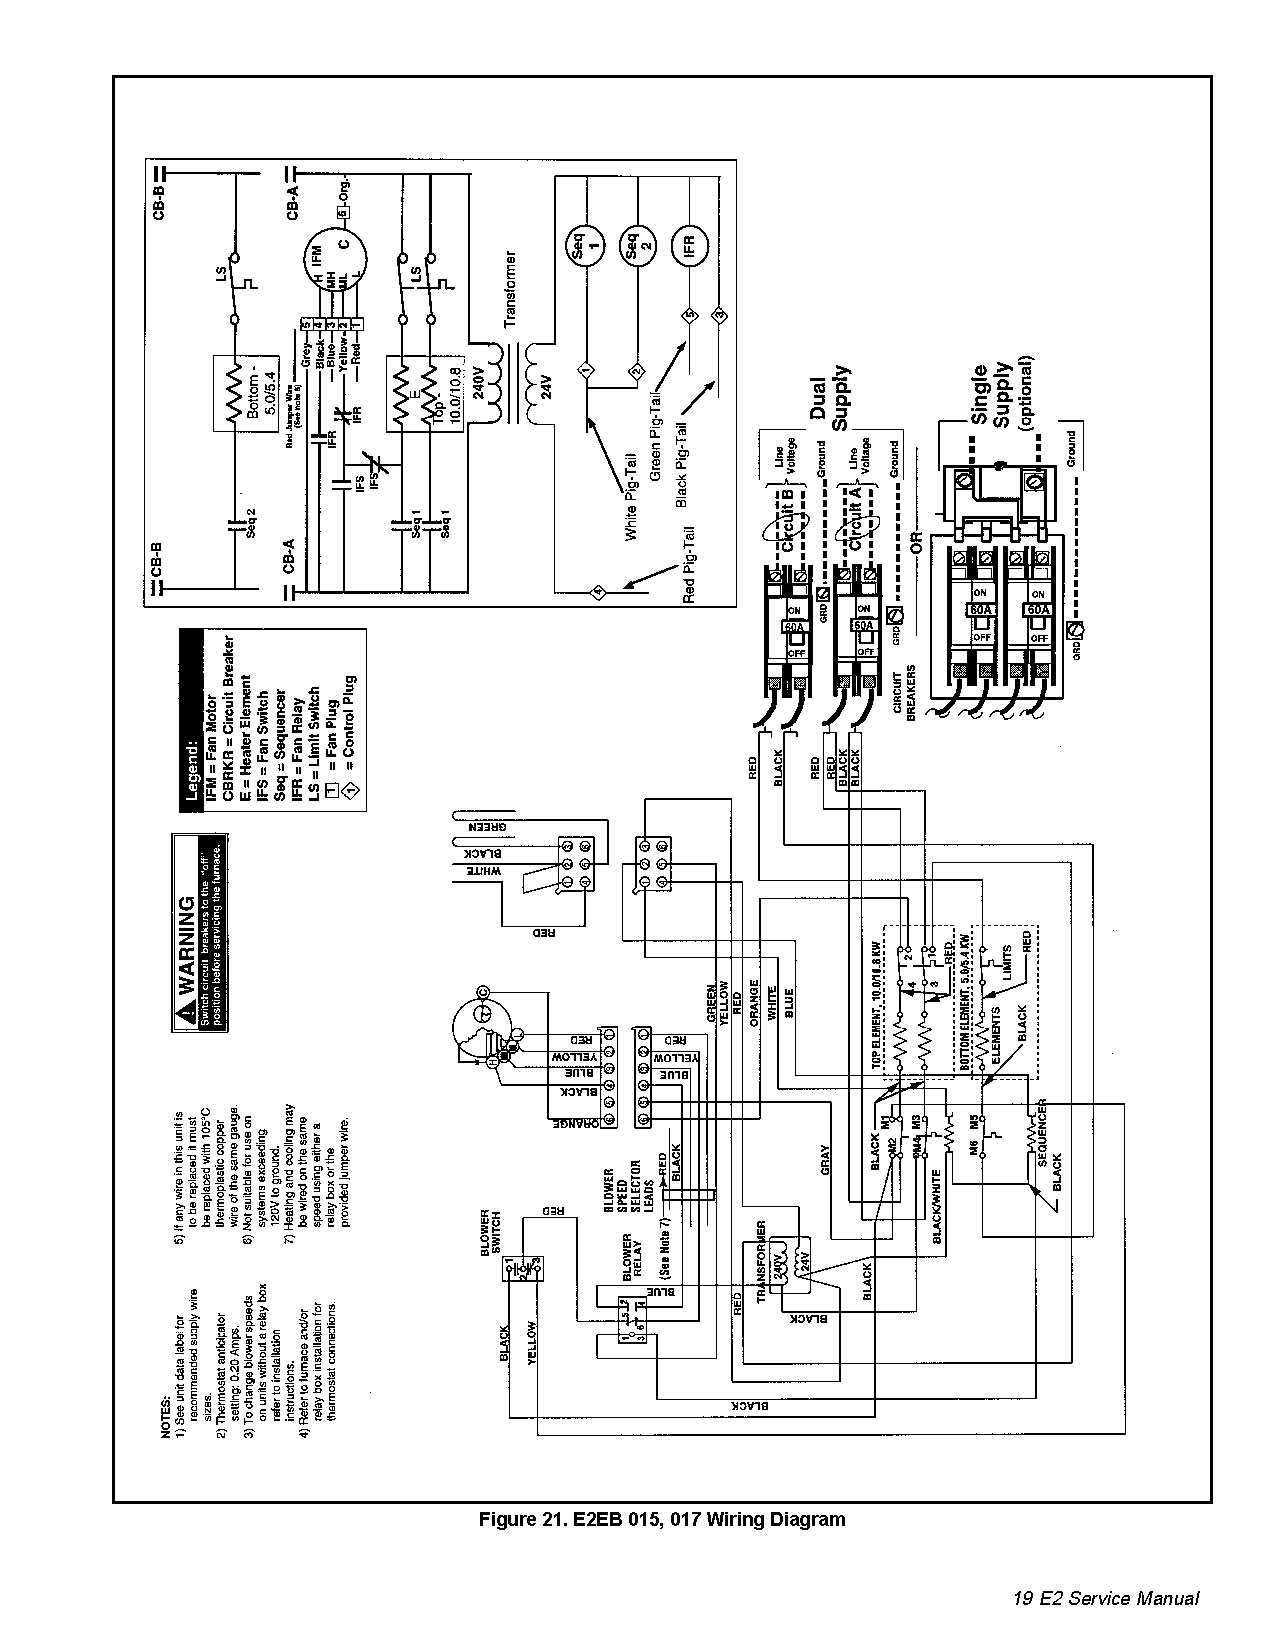 Wiring Diagram Electrical Wiring Diagram Electrical Electric Furnace Electrical Diagram Furnace